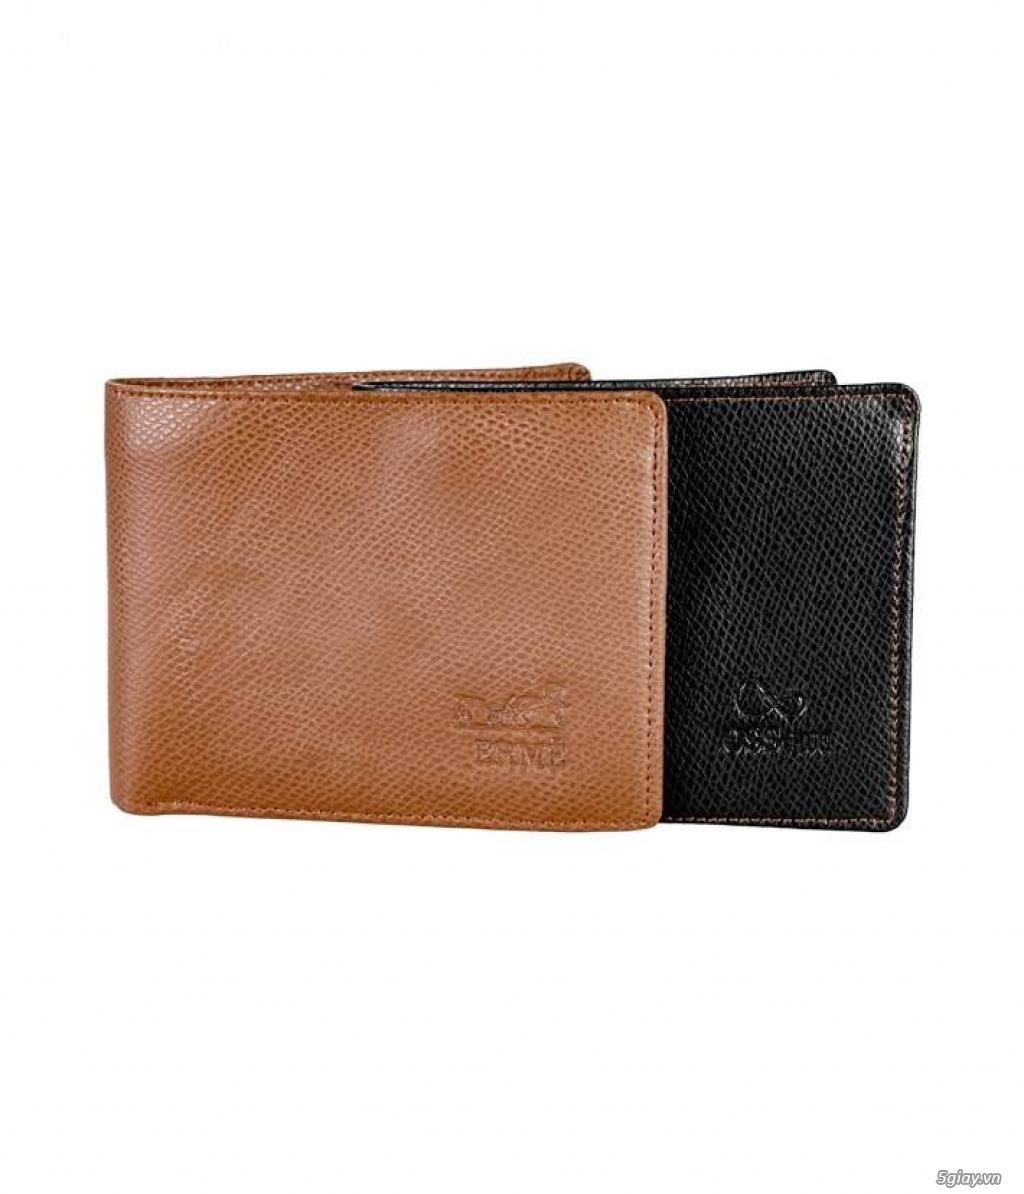 Khai Trương Shop Bóp Ví, Thắt Lưng Da Leather Wolrd Big Sale 30% - 1